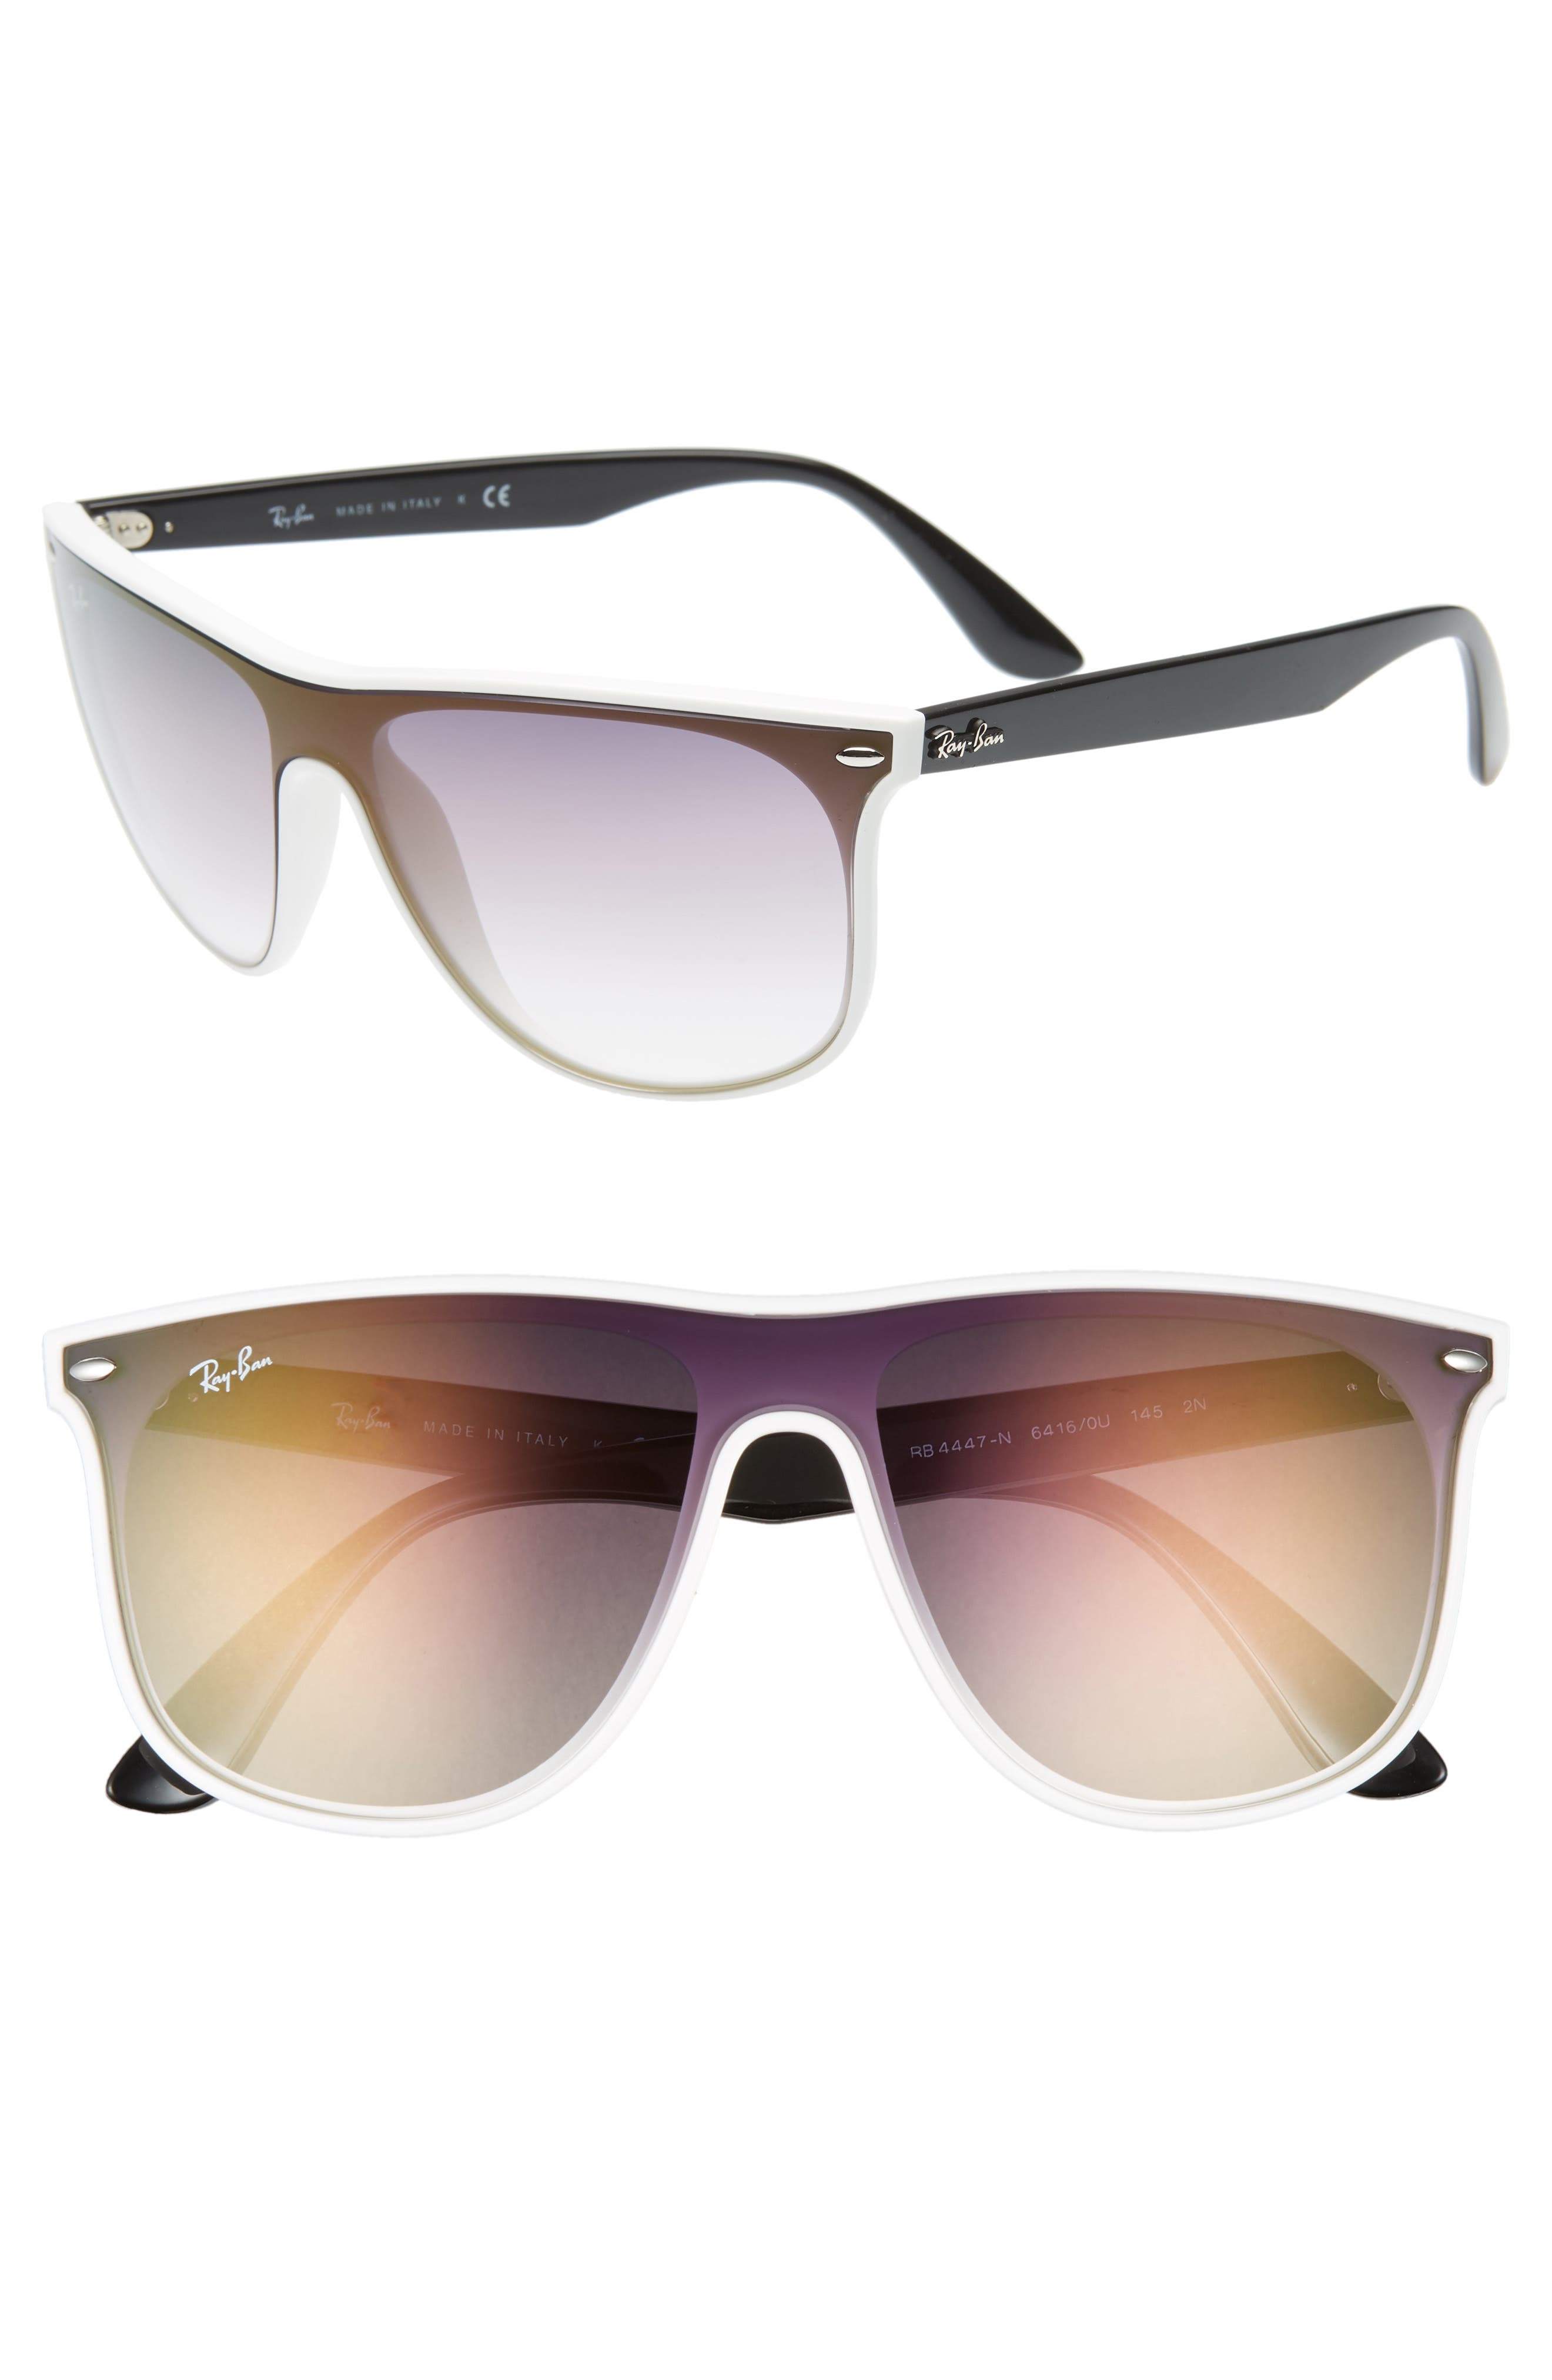 Ray-Ban Blaze 55Mm Sunglasses - White